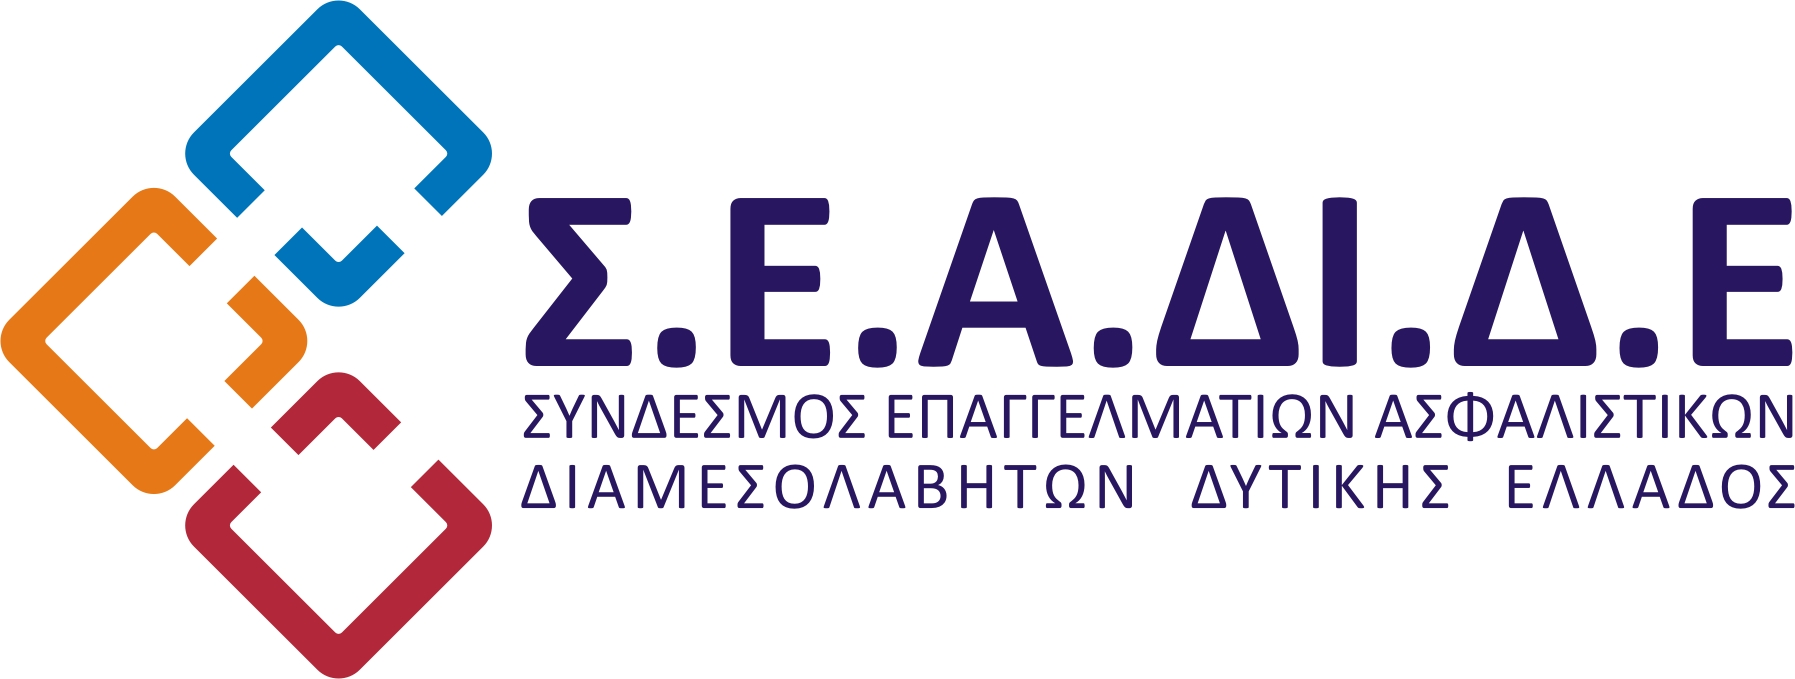 seadide-logo